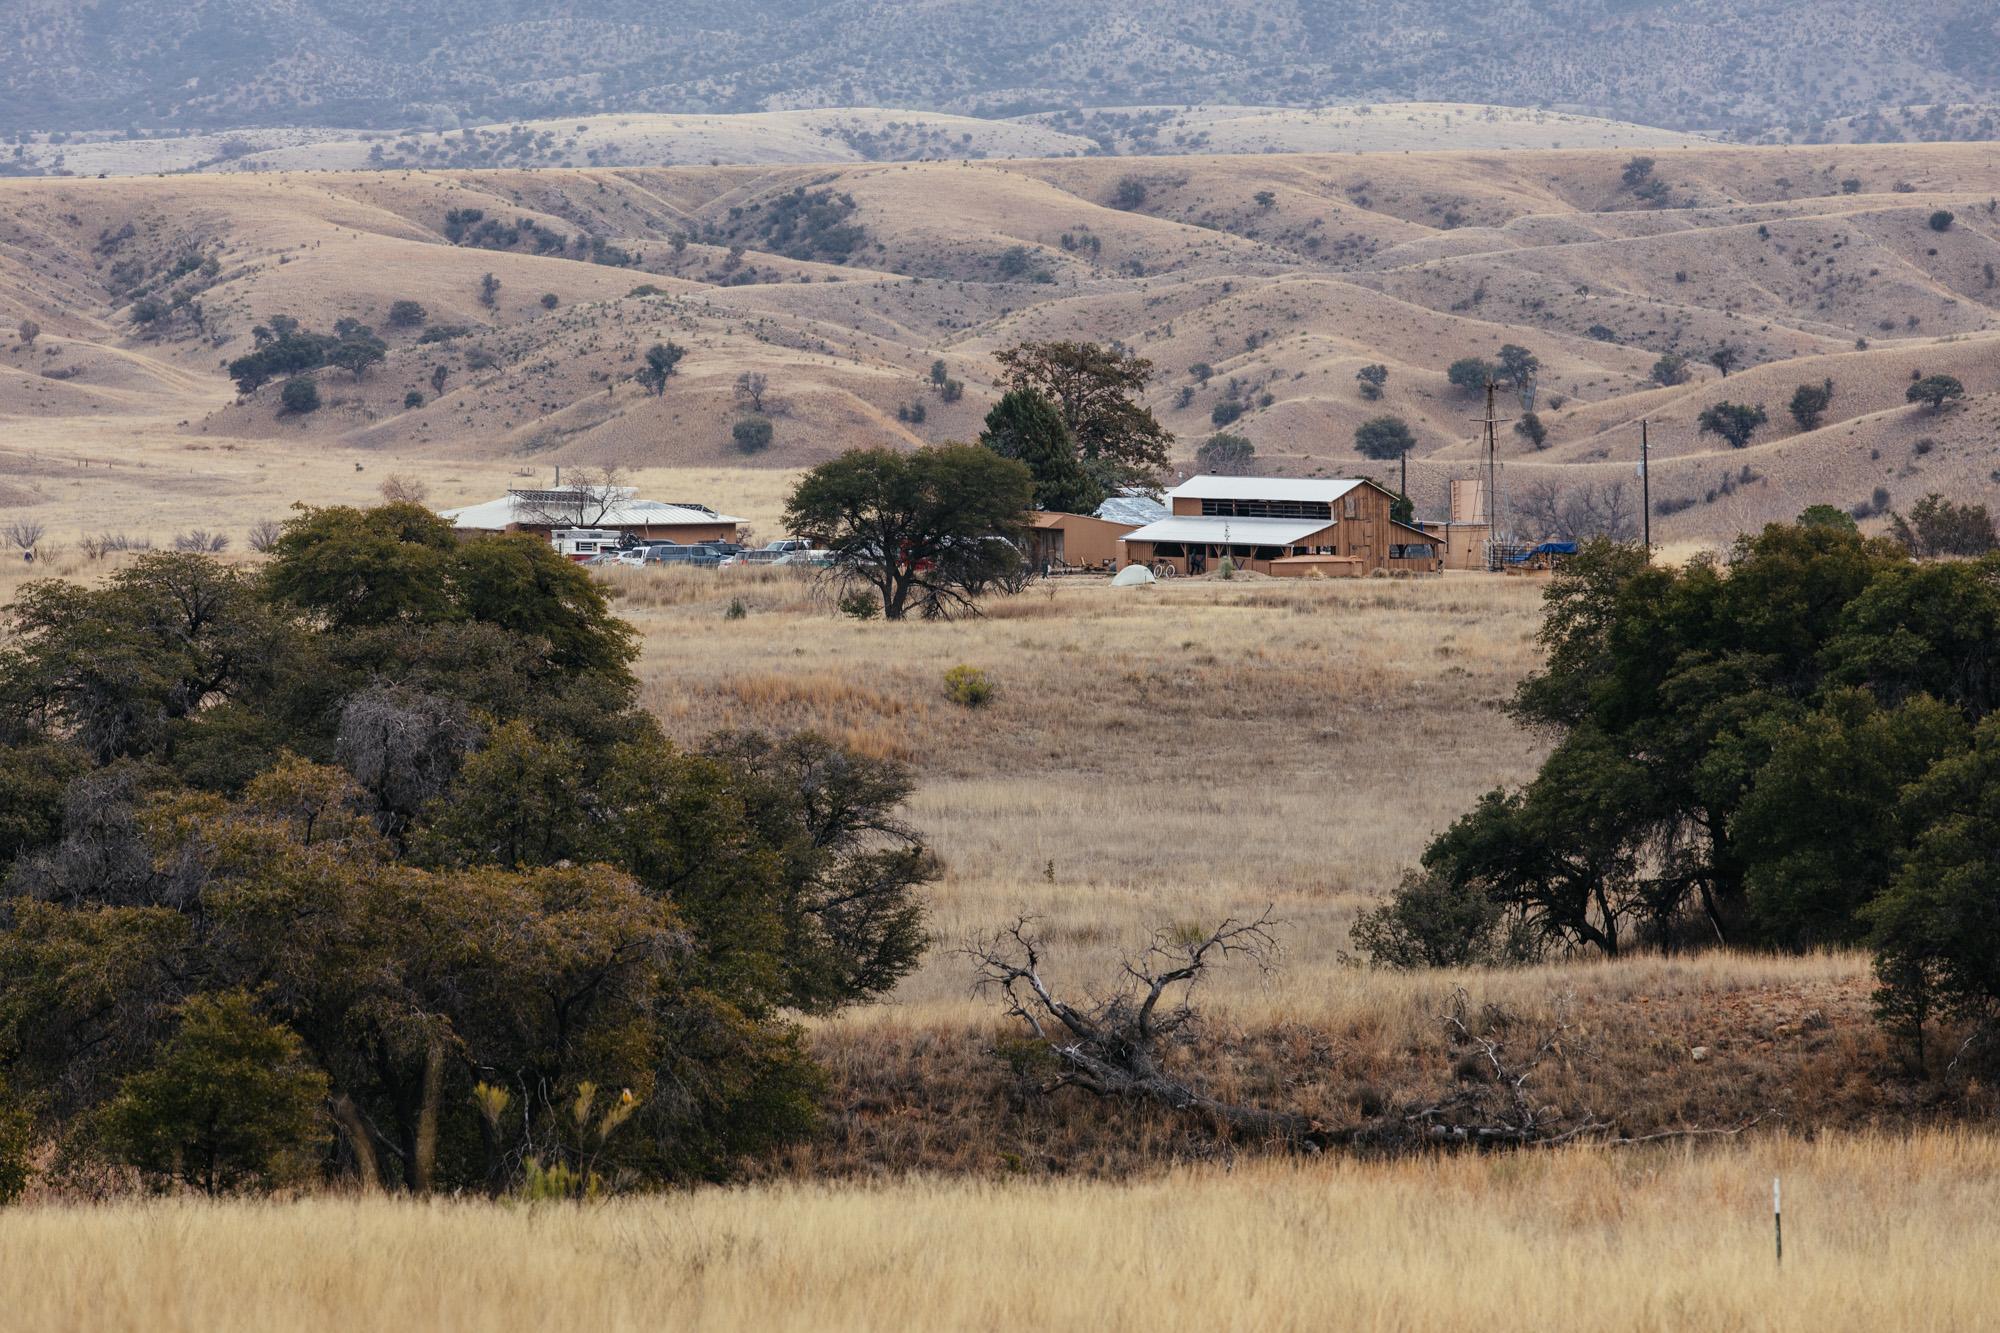 Appleton-Whittell Research Ranch